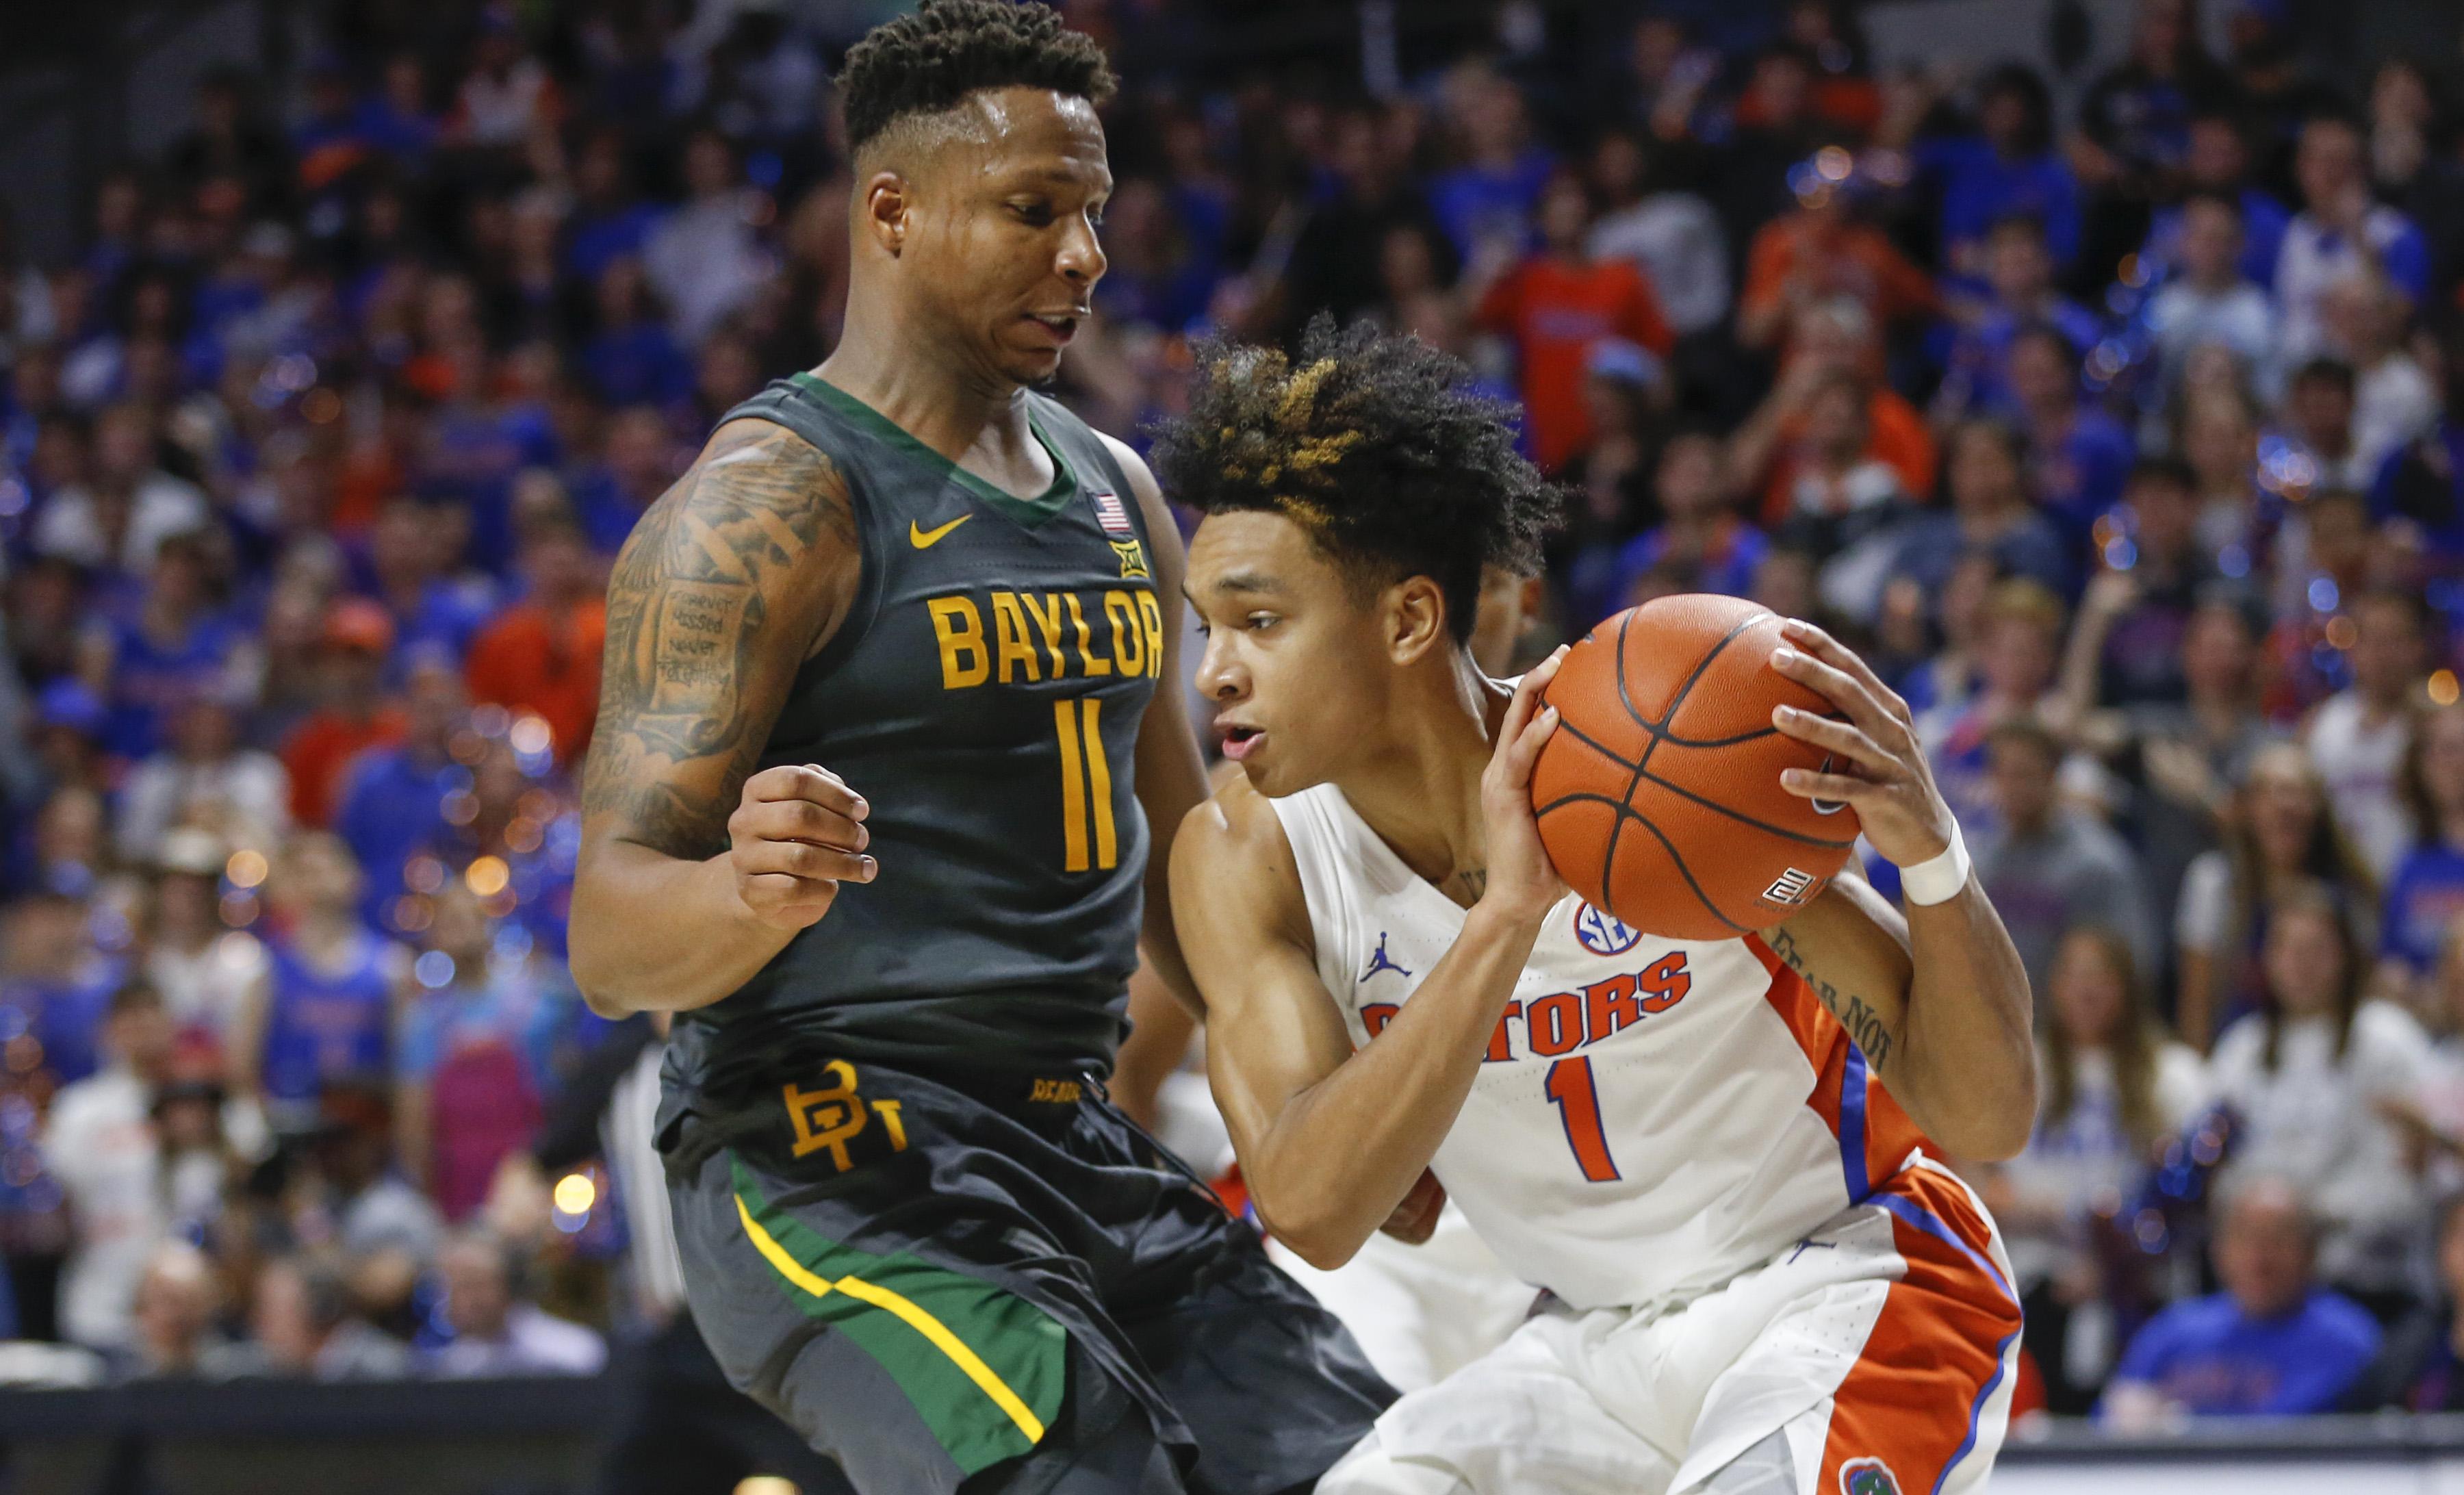 NCAA Basketball: Baylor at Florida